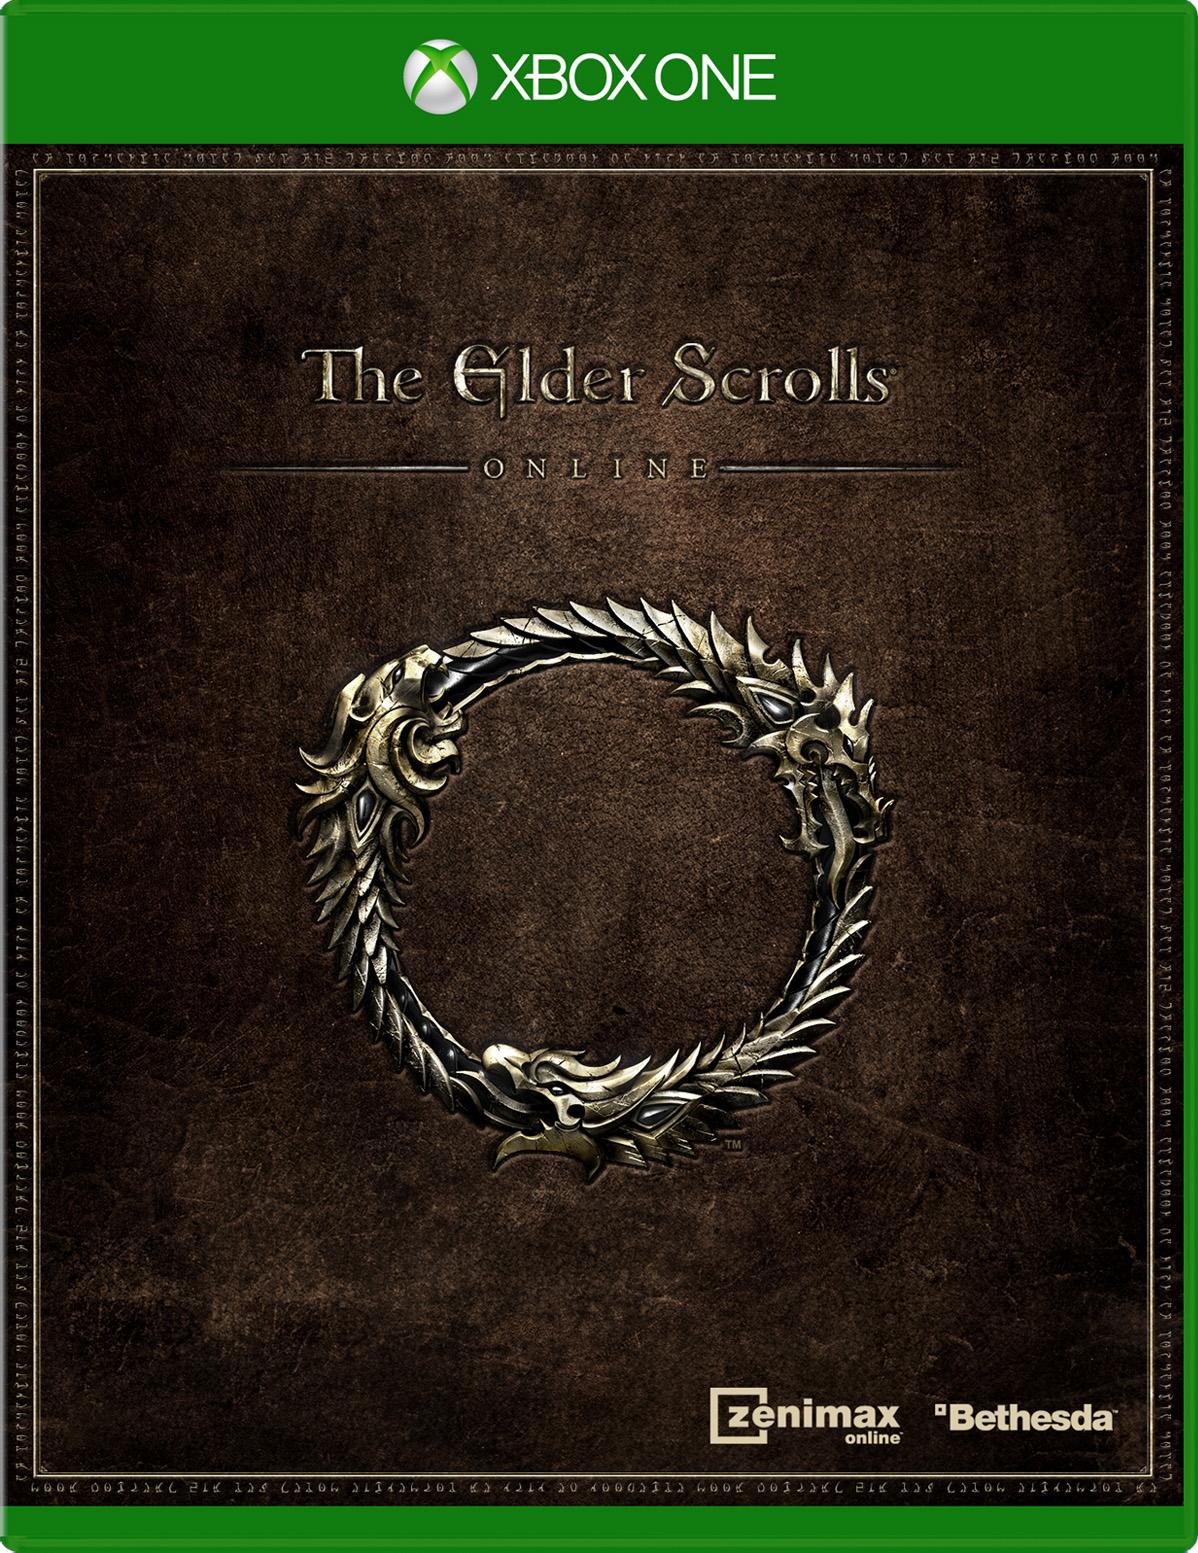 The Elder Scrolls Online for Xbox One